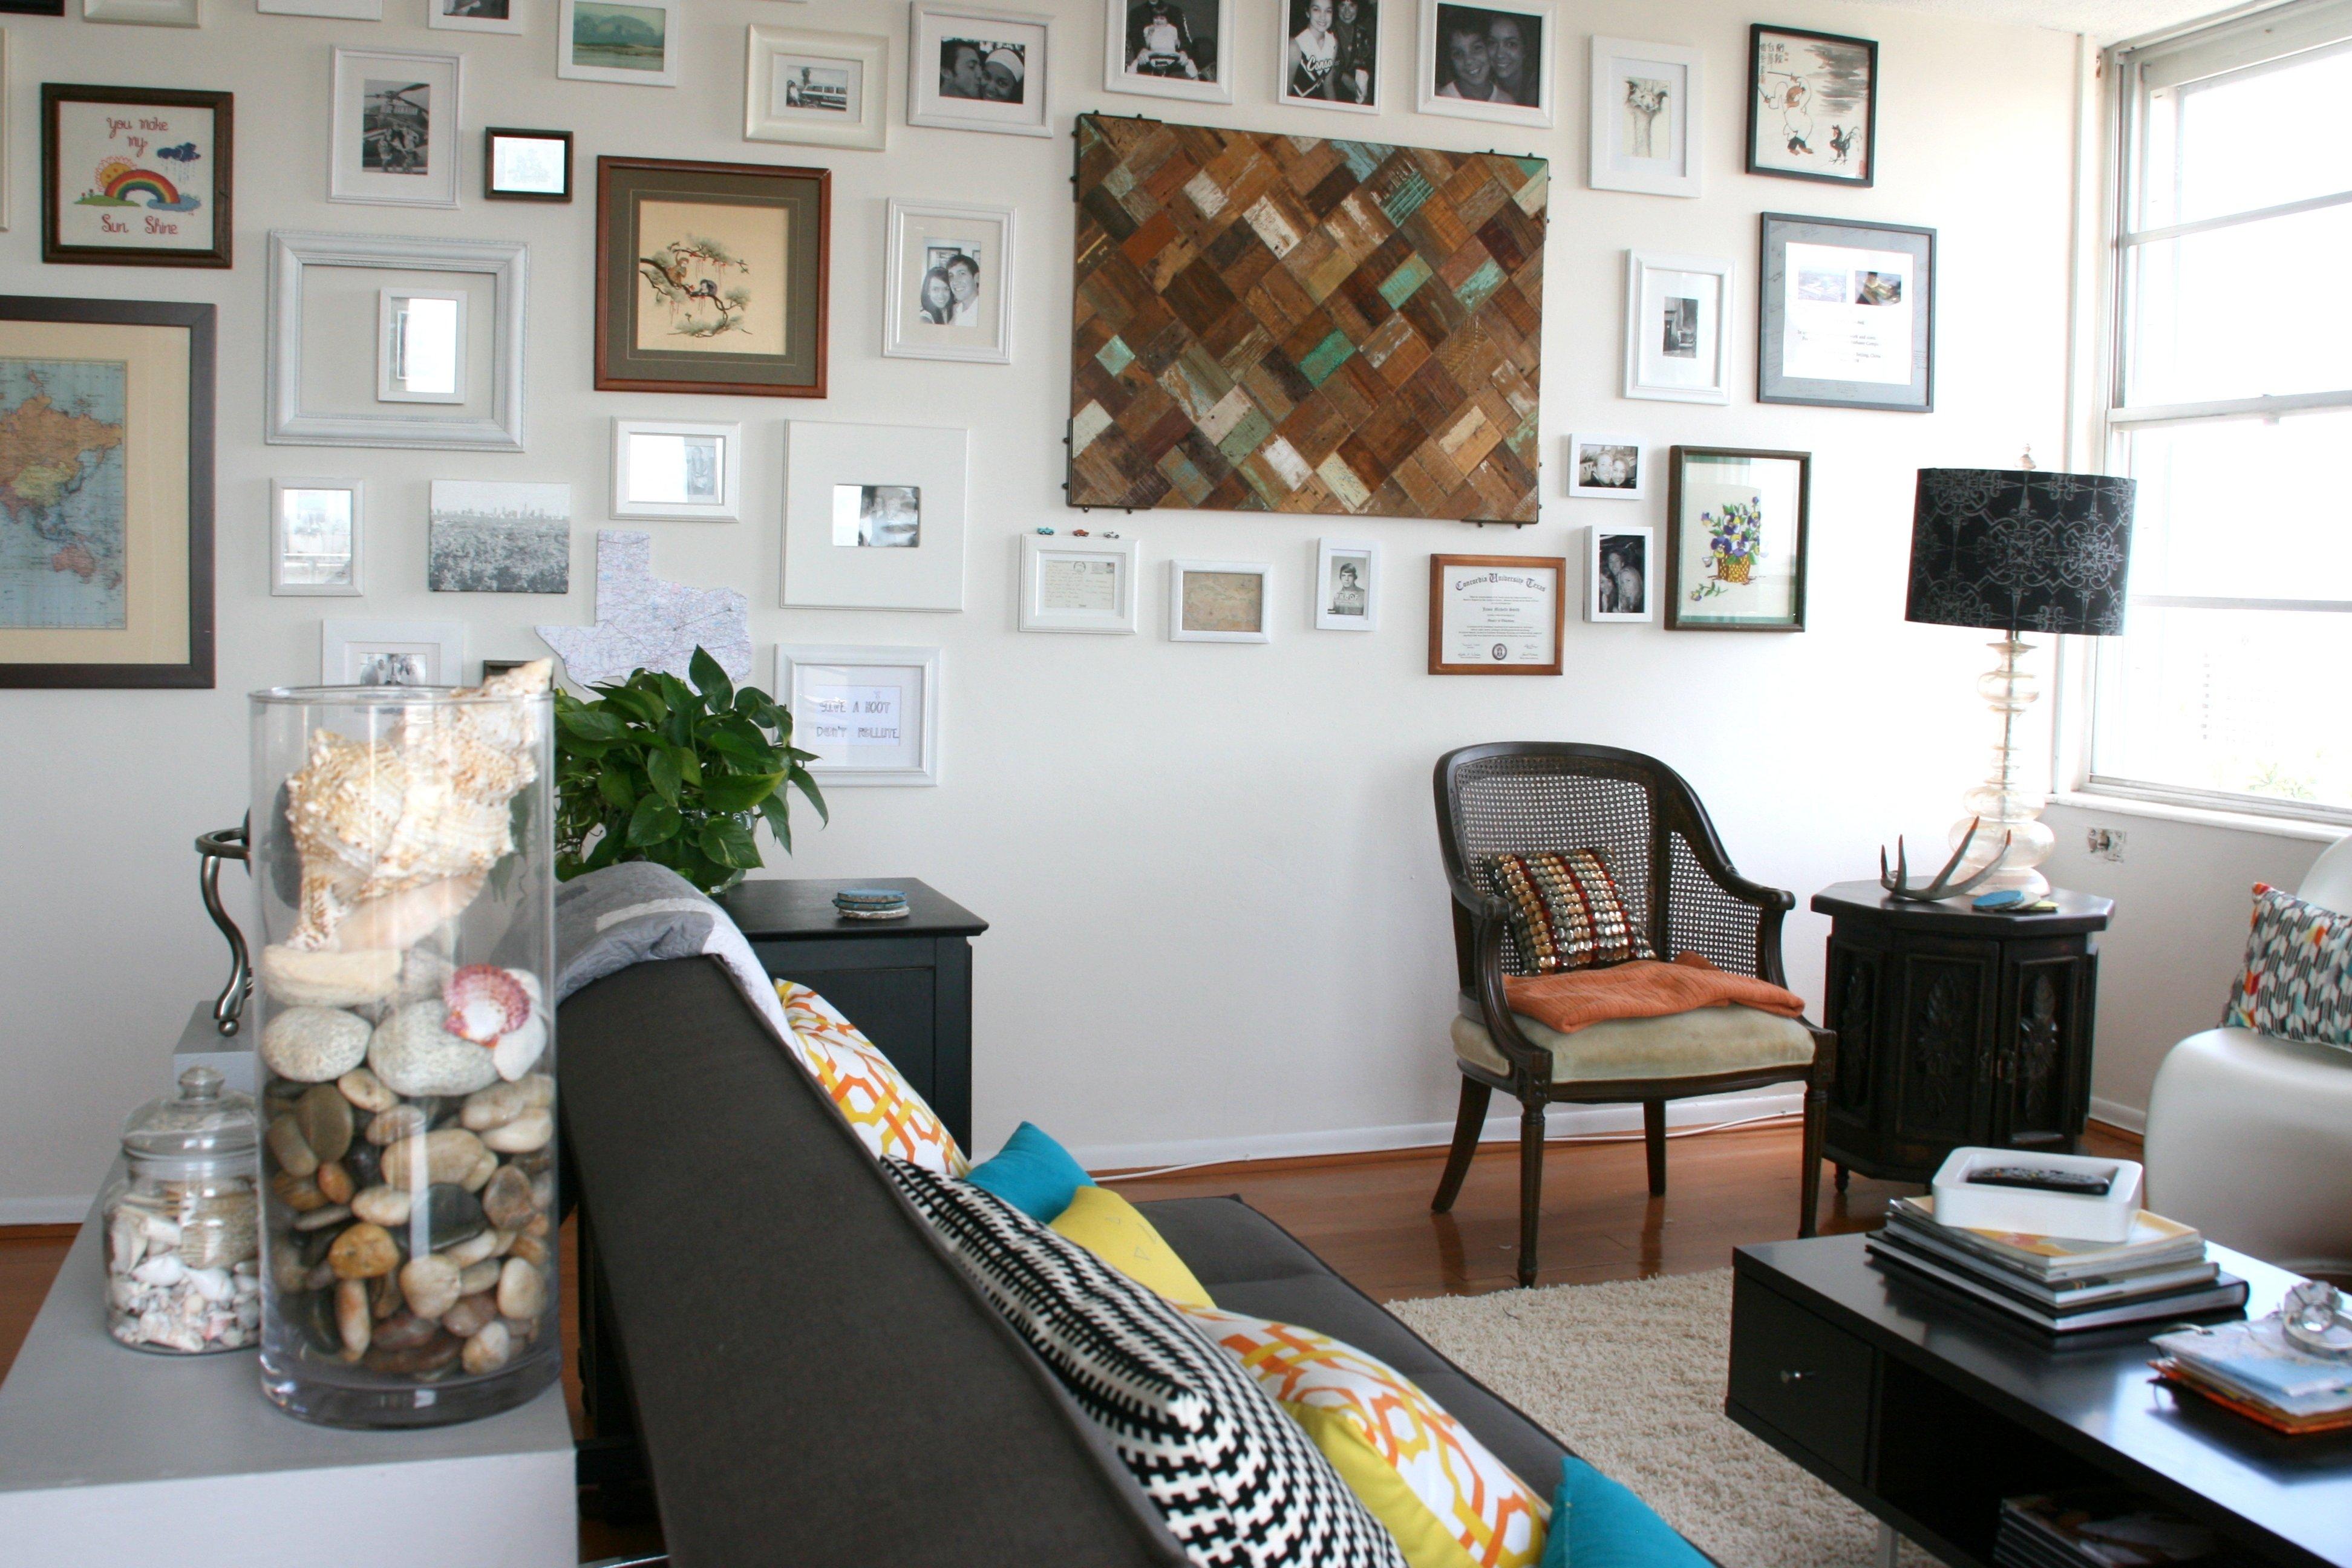 10 Most Popular Diy Decorating Ideas For Apartments apartment cute decorating small spaces diy college studio eas ideas 2020